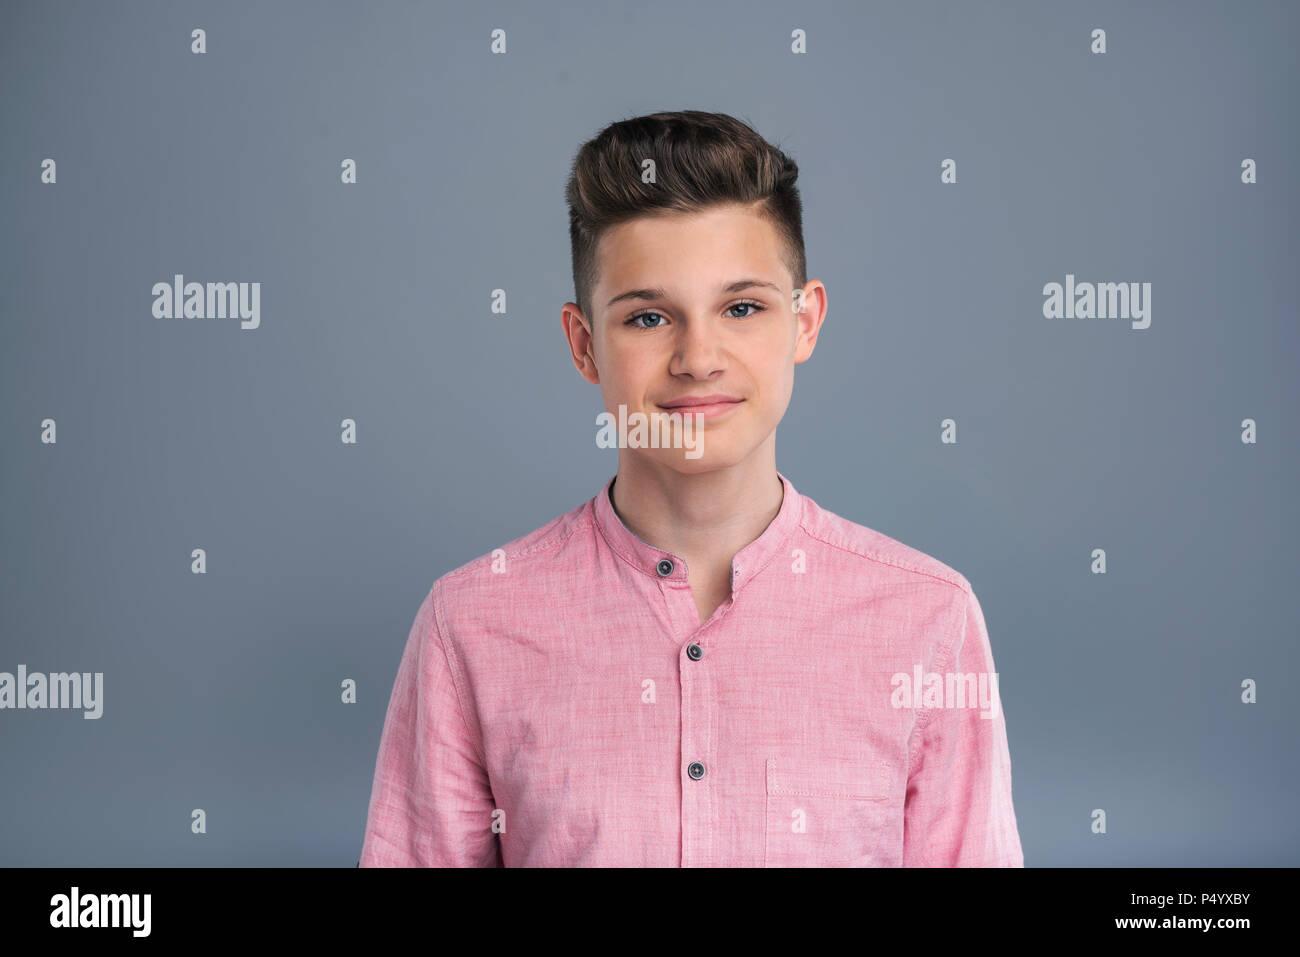 Portrait of a handsome teenage boy - Stock Image